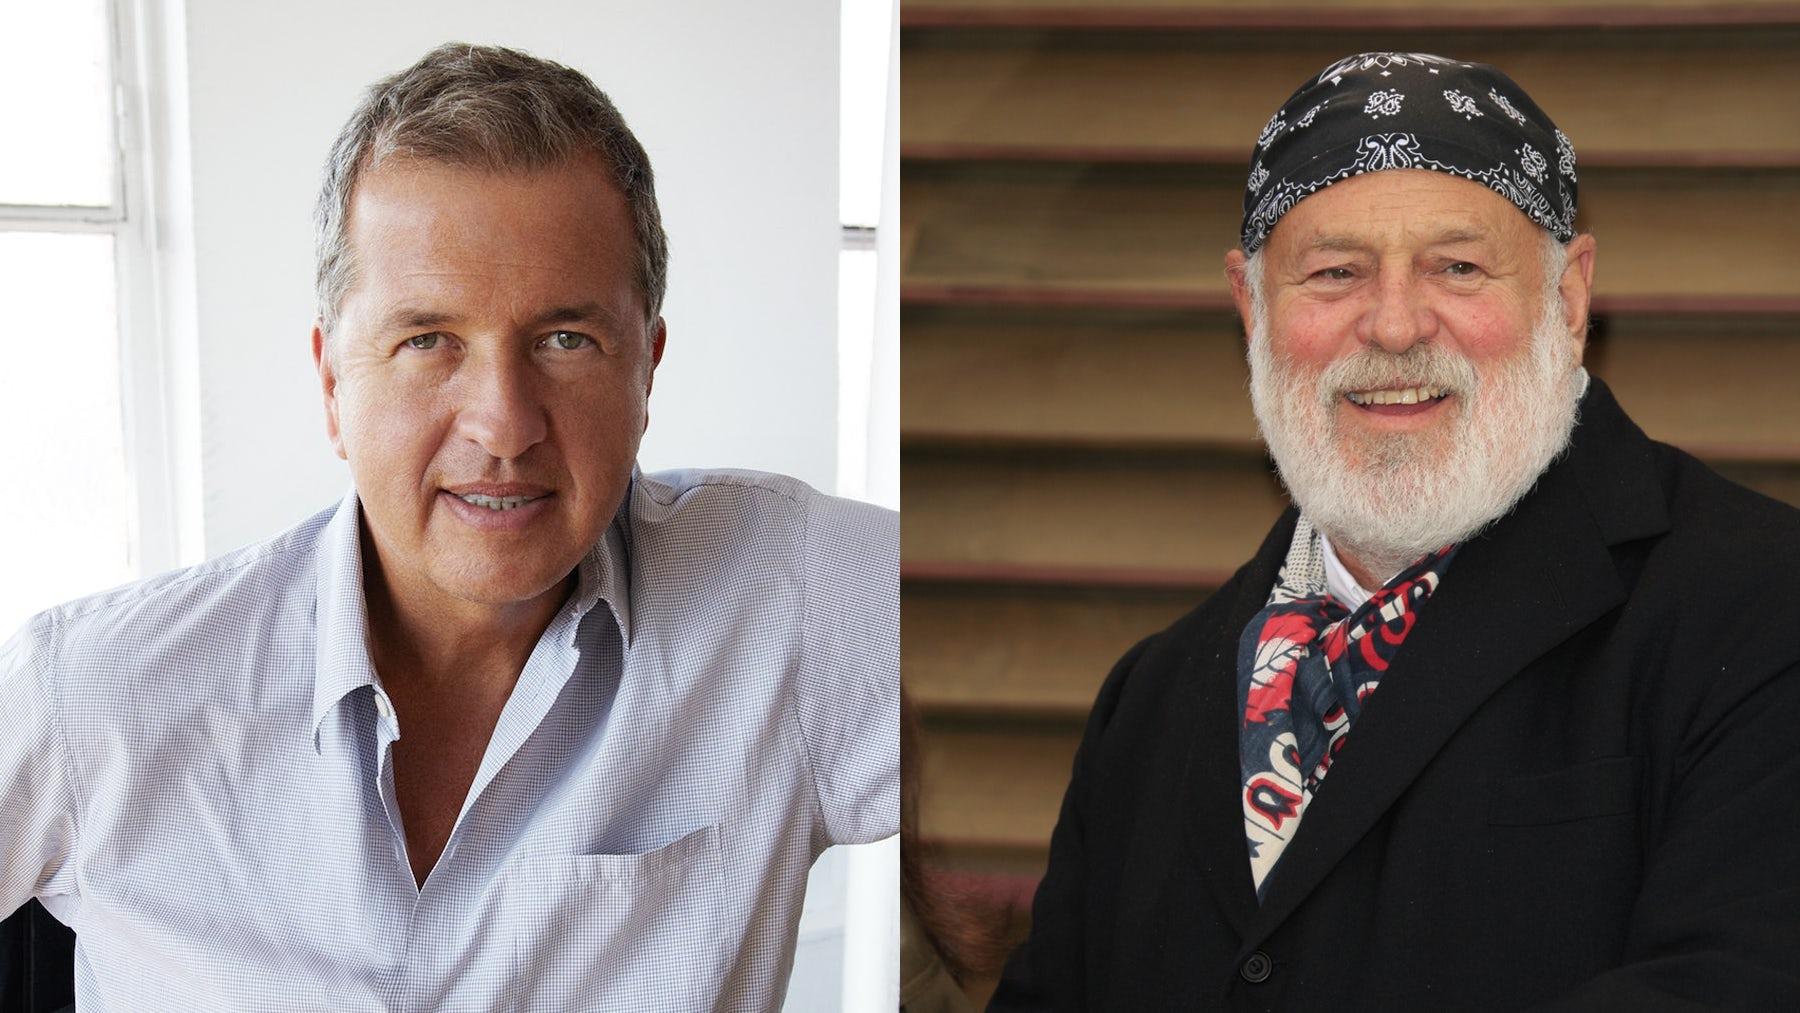 Mario Testino and Bruce Weber | Photo: Alex Bramall, Shutterstock